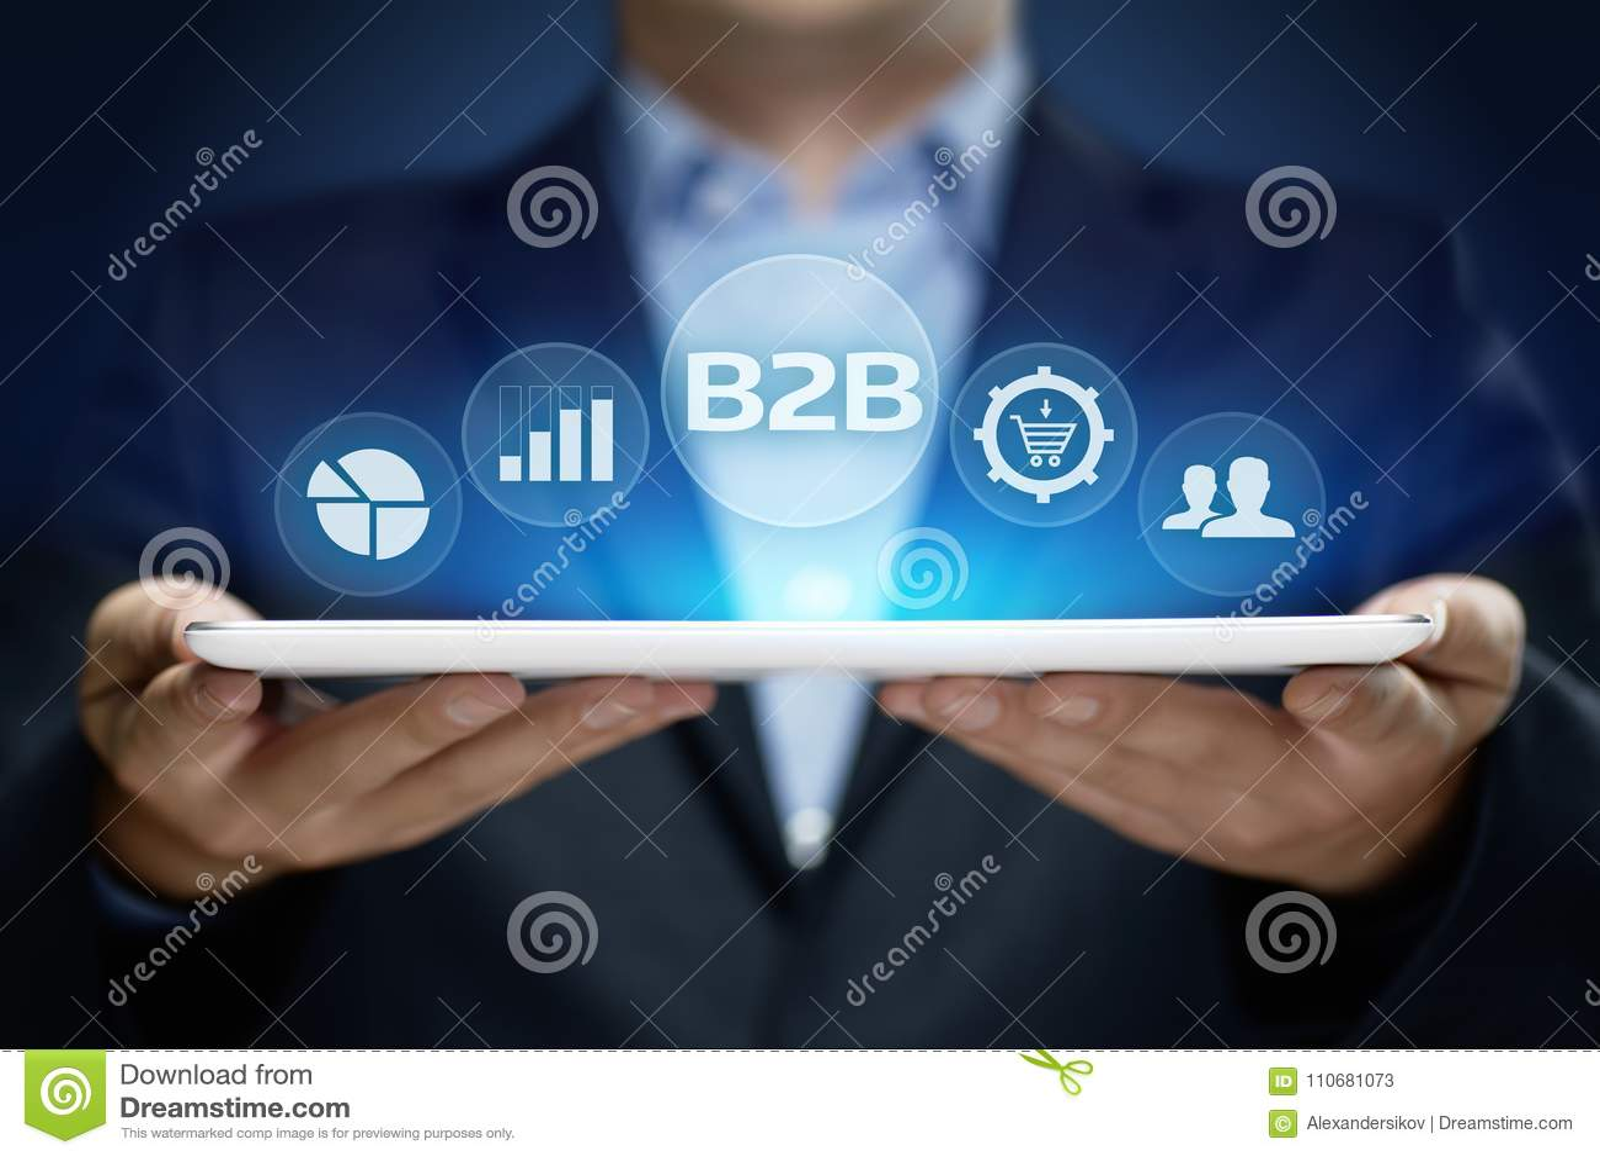 B2B Business Company Commerce Technology Marketing concept